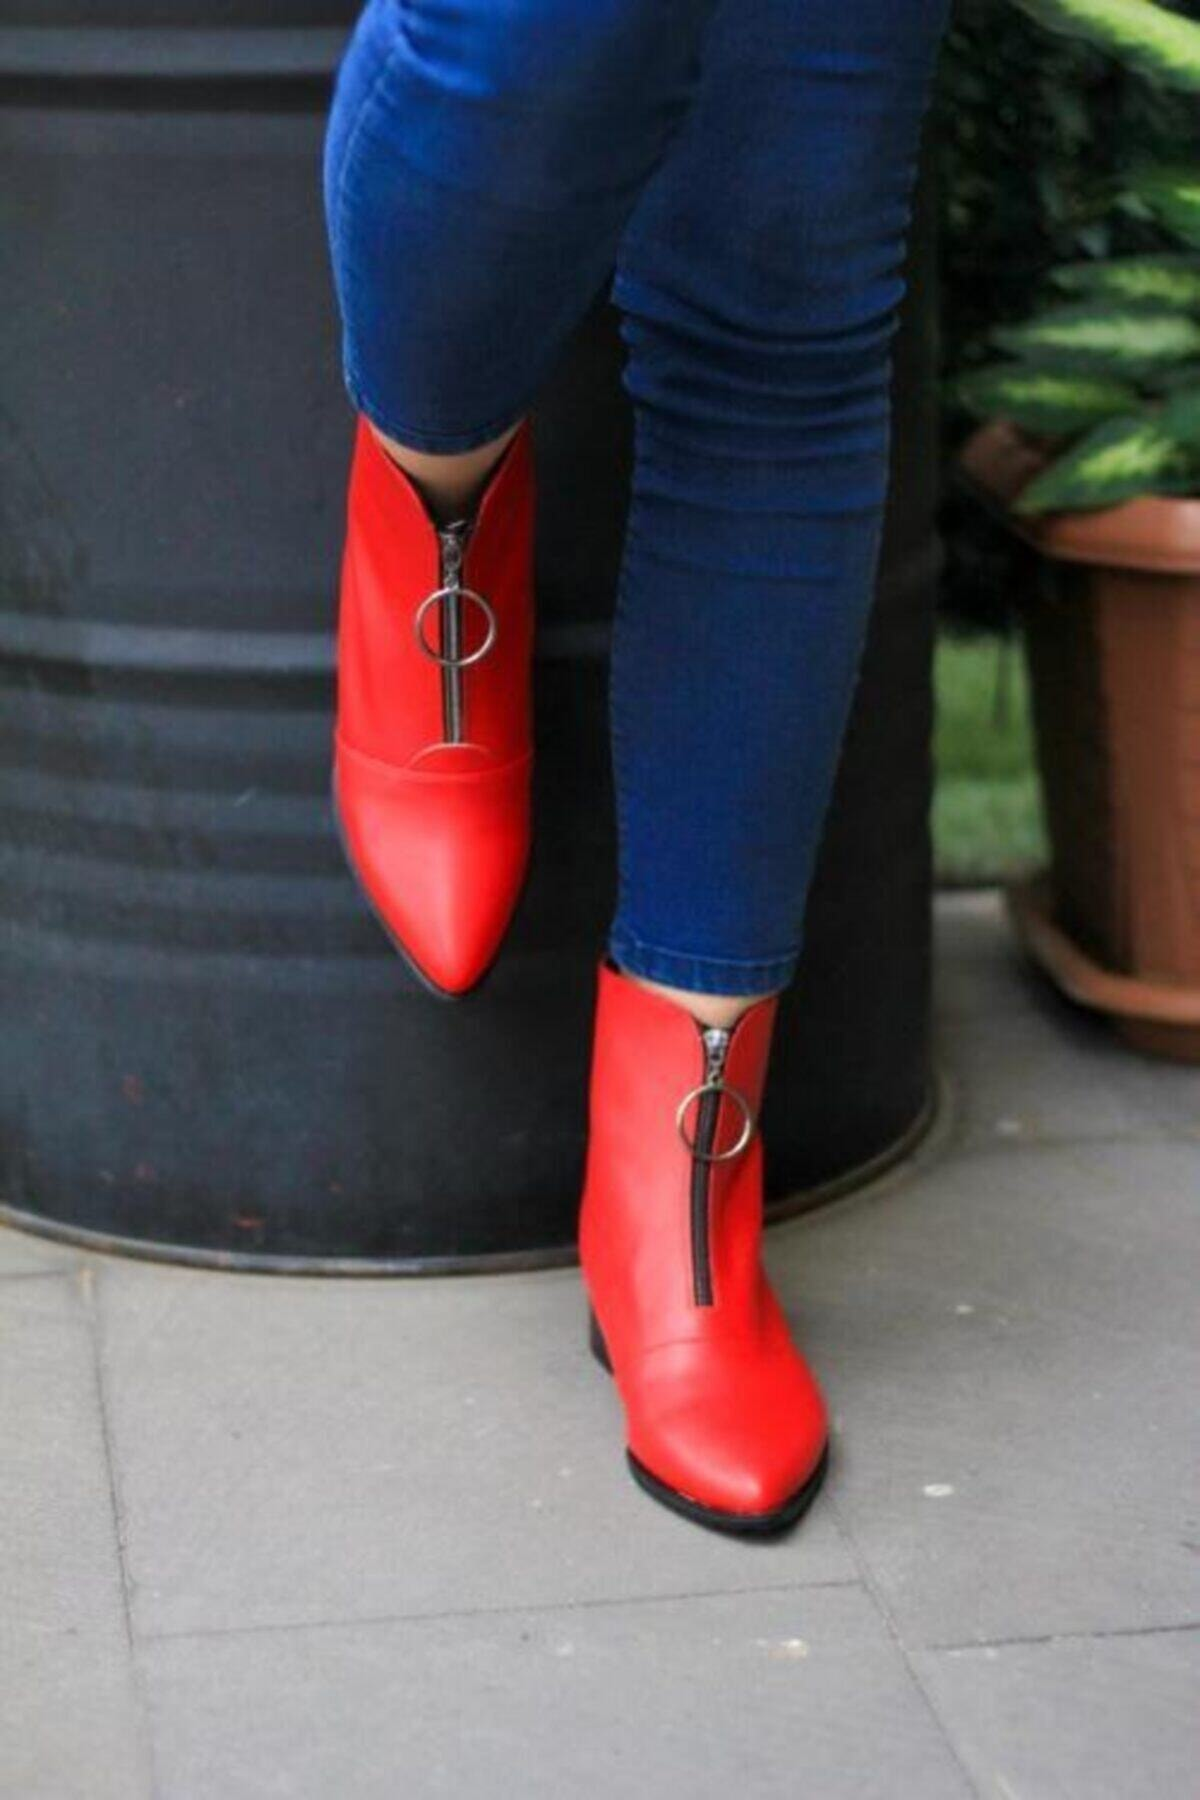 S&S Kadın Kırmızı Topuklu Bot 1